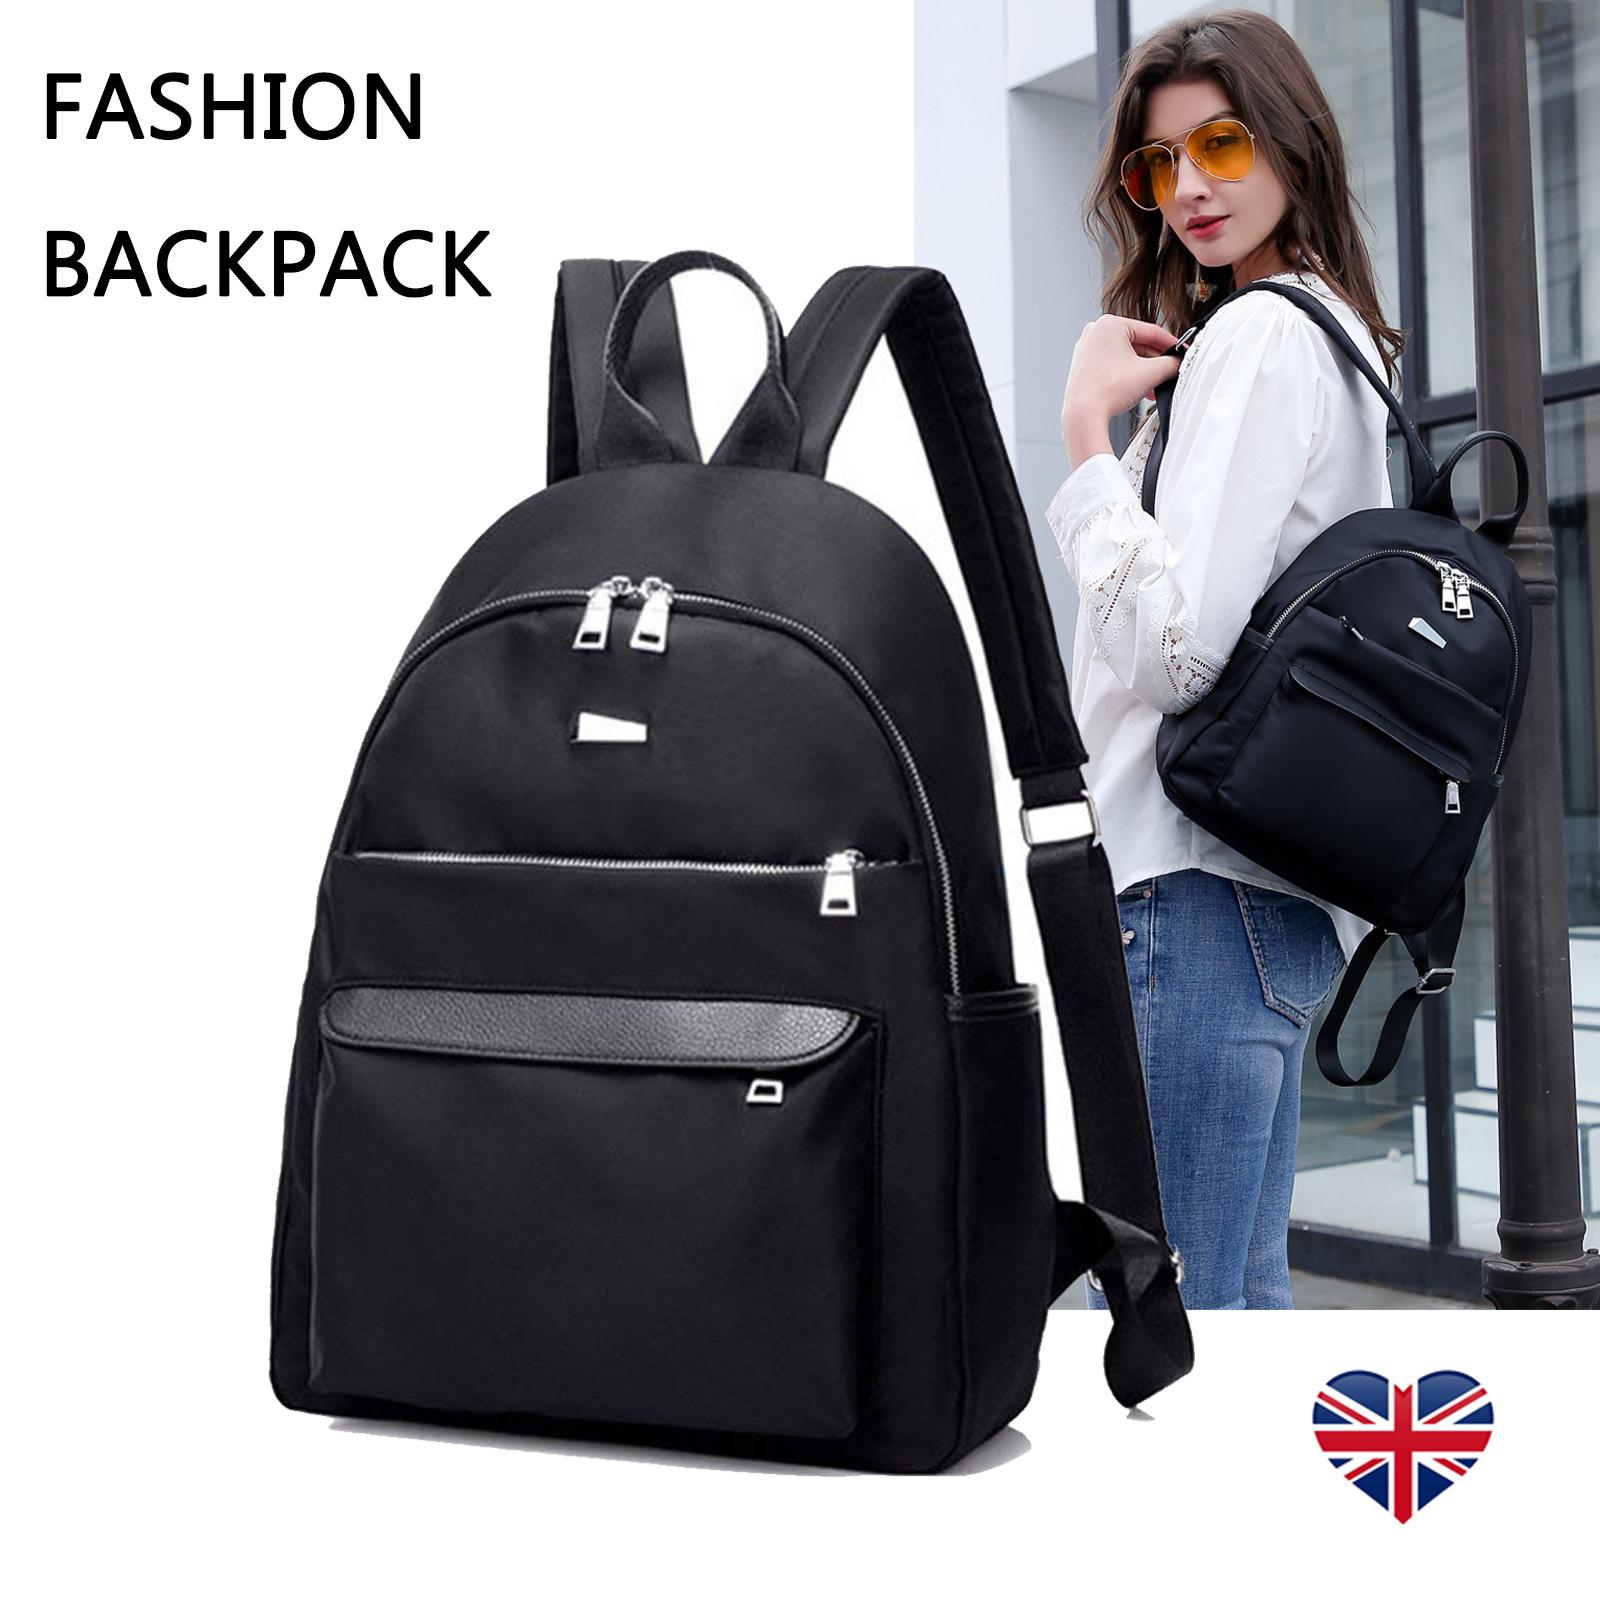 c5f74c2fac Details about Women Girls Ladies Fashion Backpack Rucksack Travel Shoulder College  School Bag